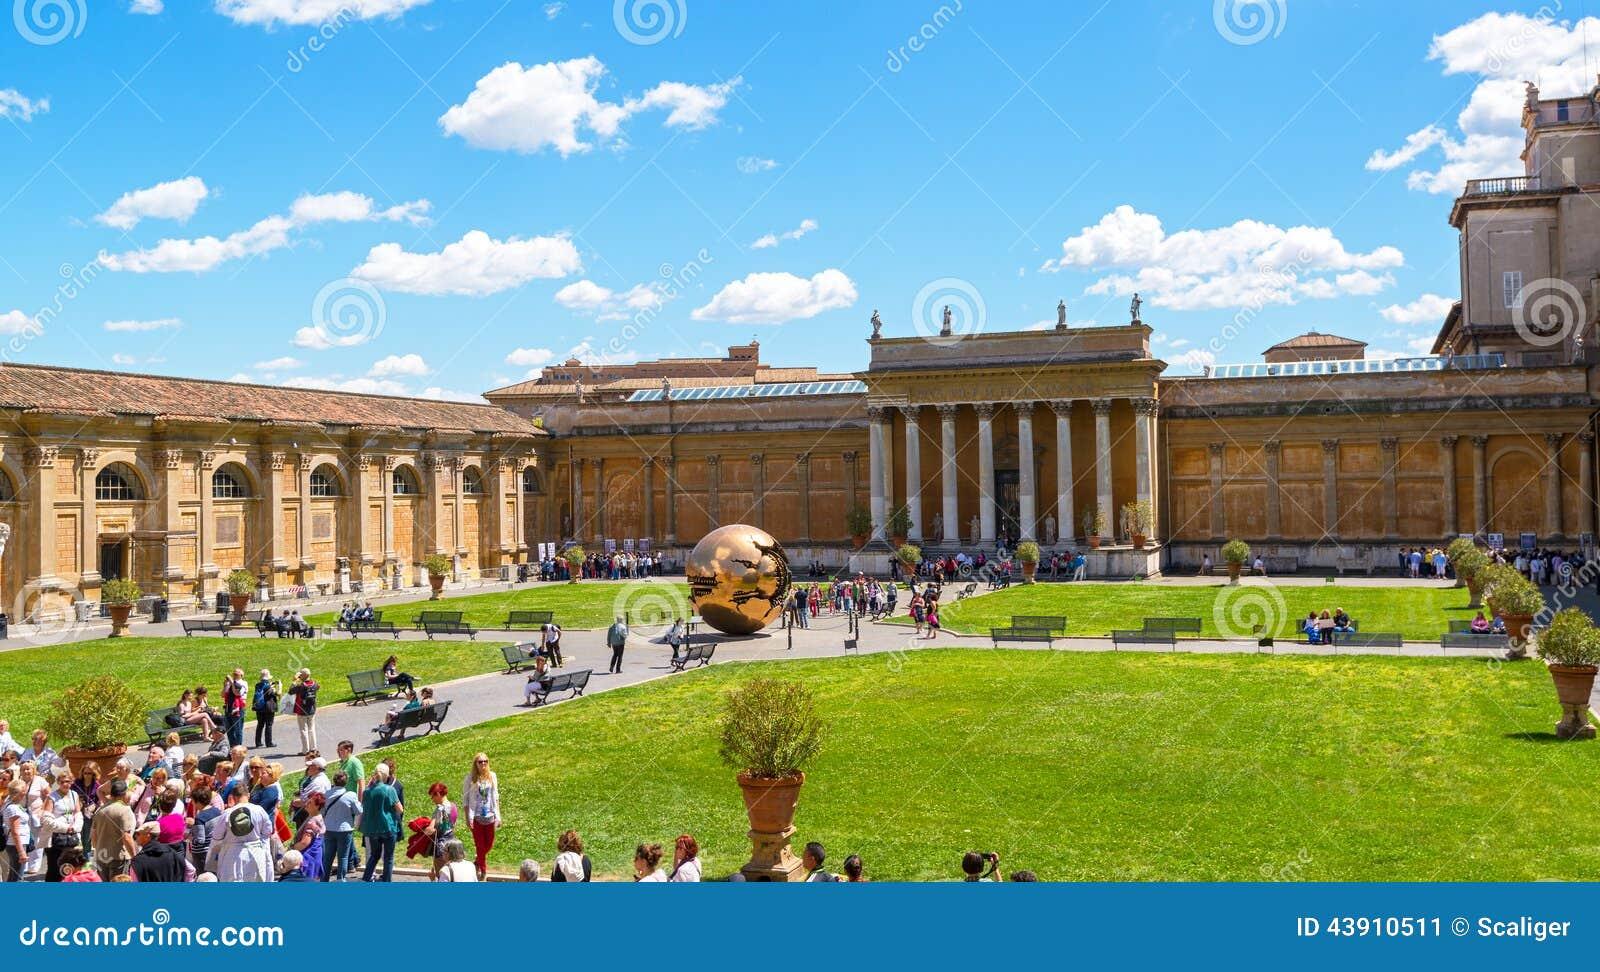 The courtyard of Vatican Museum